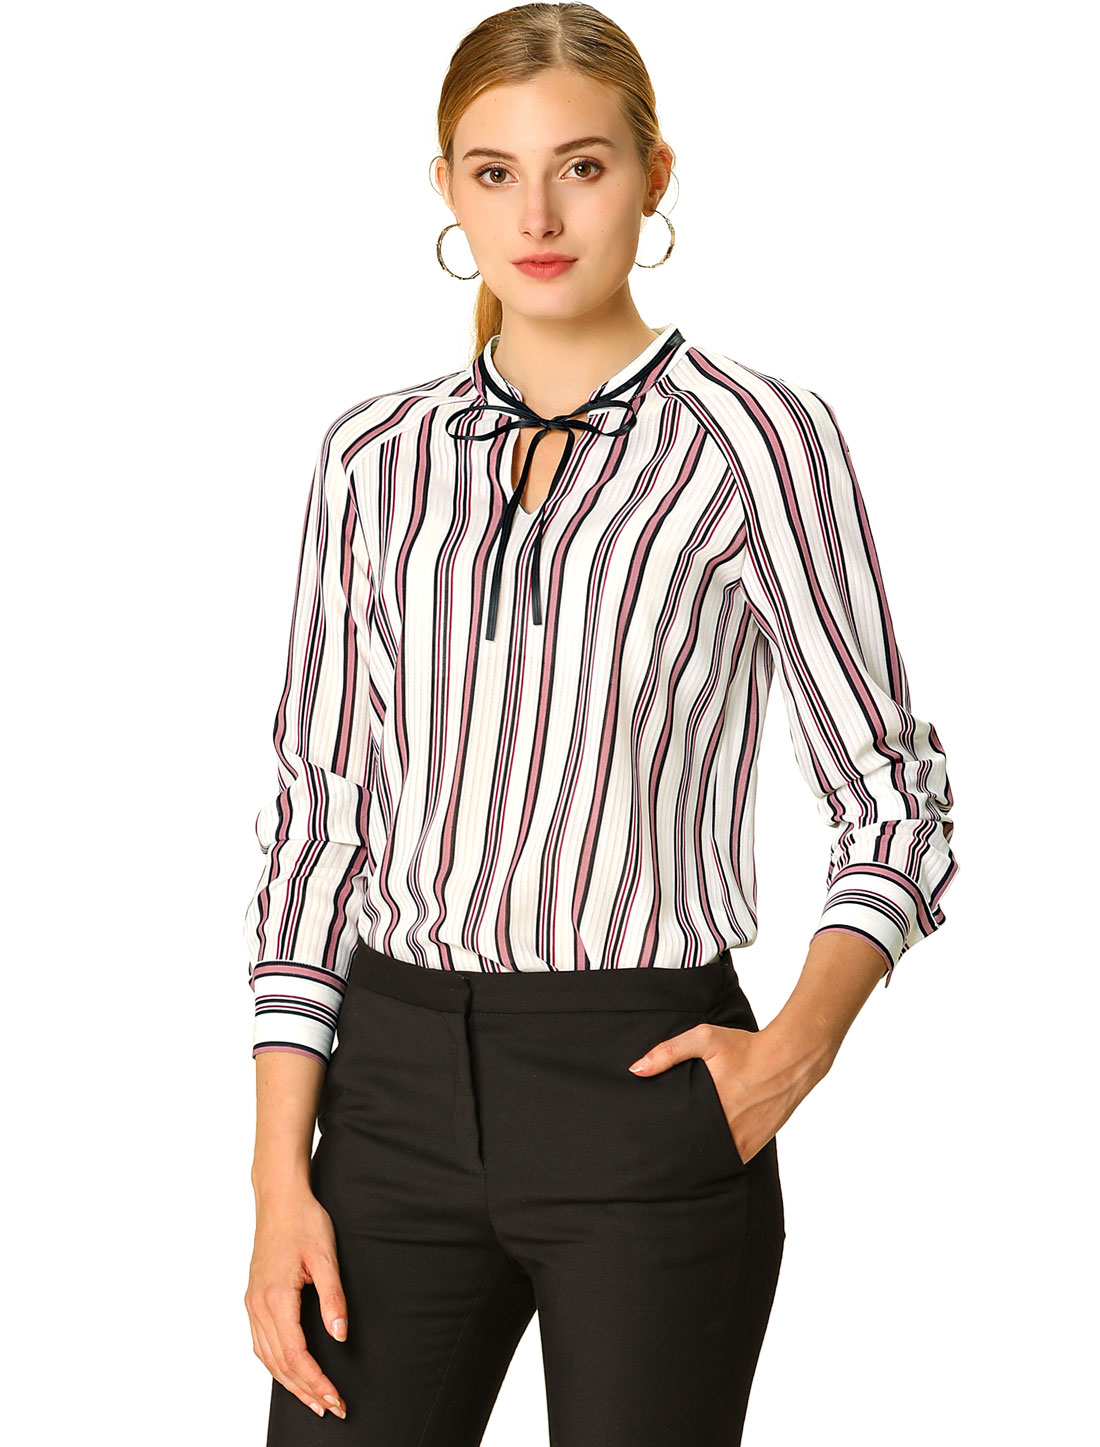 Allegra K Women's Office Blouse Long Sleeve Tie Striped Shirt Pink S